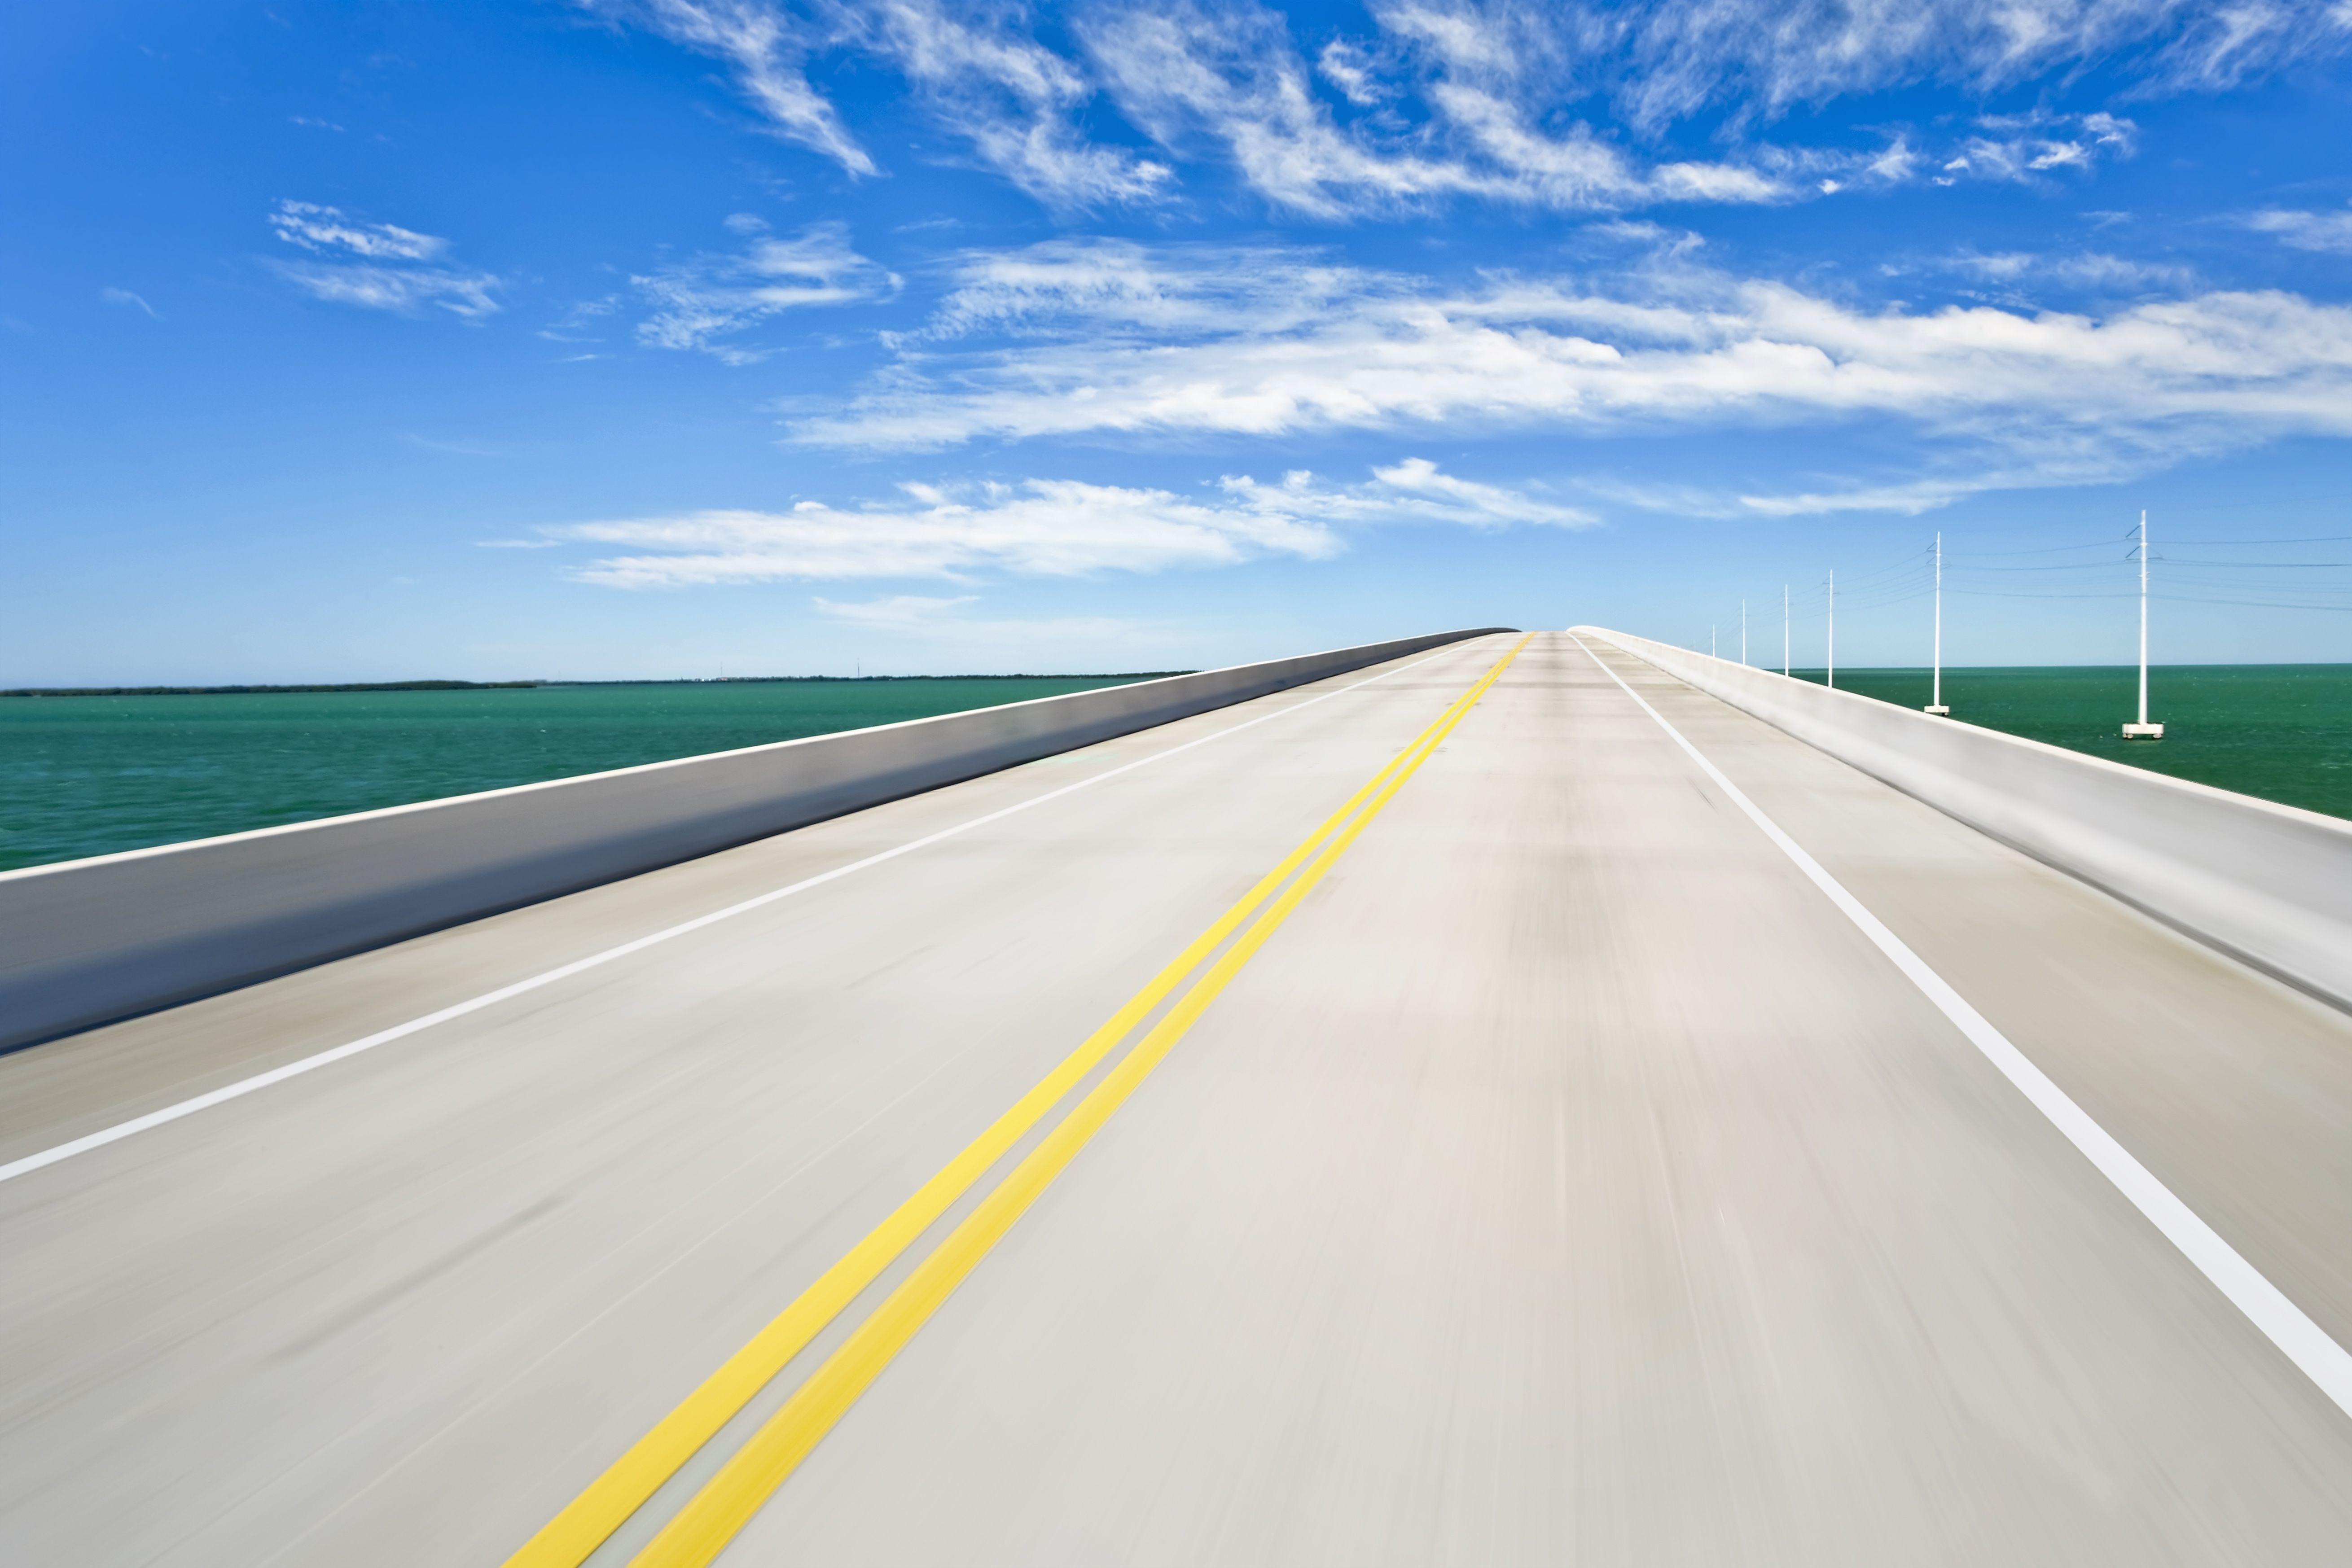 Sales Tax In Orlando Florida >> Florida's Worst Speed Traps